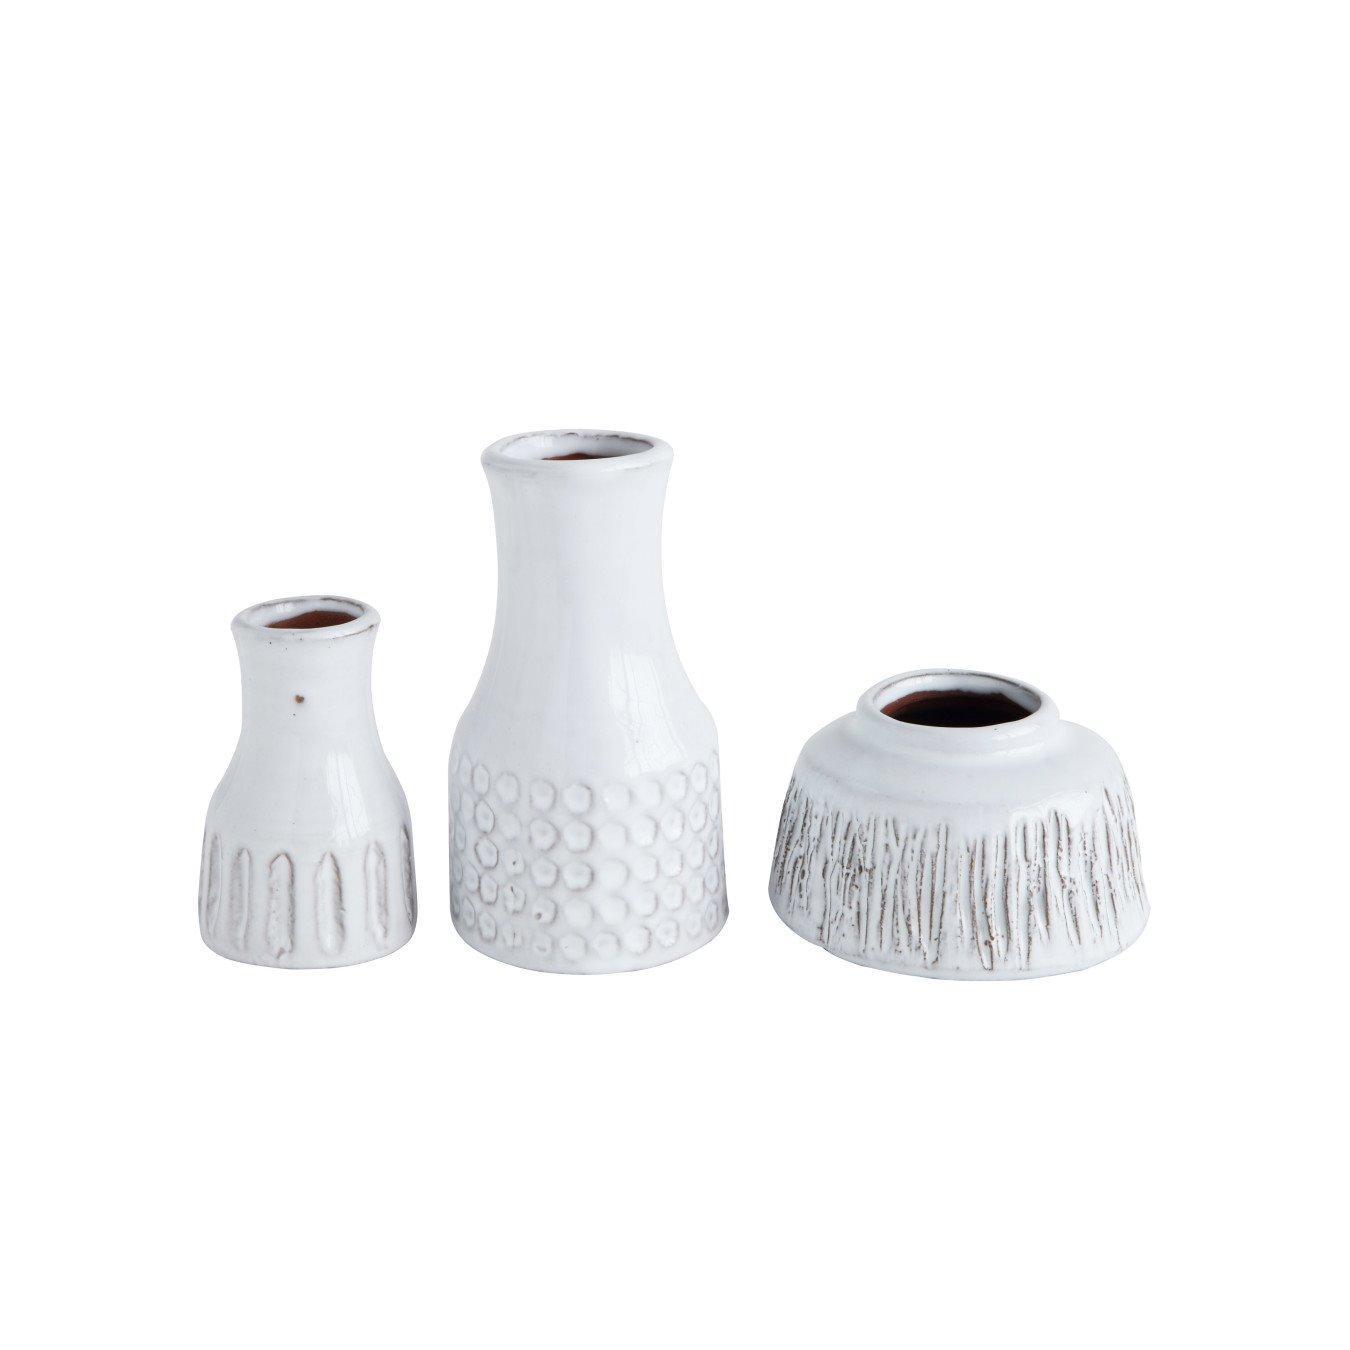 Distressed White Terracotta Vases (Set of 3 Styles)